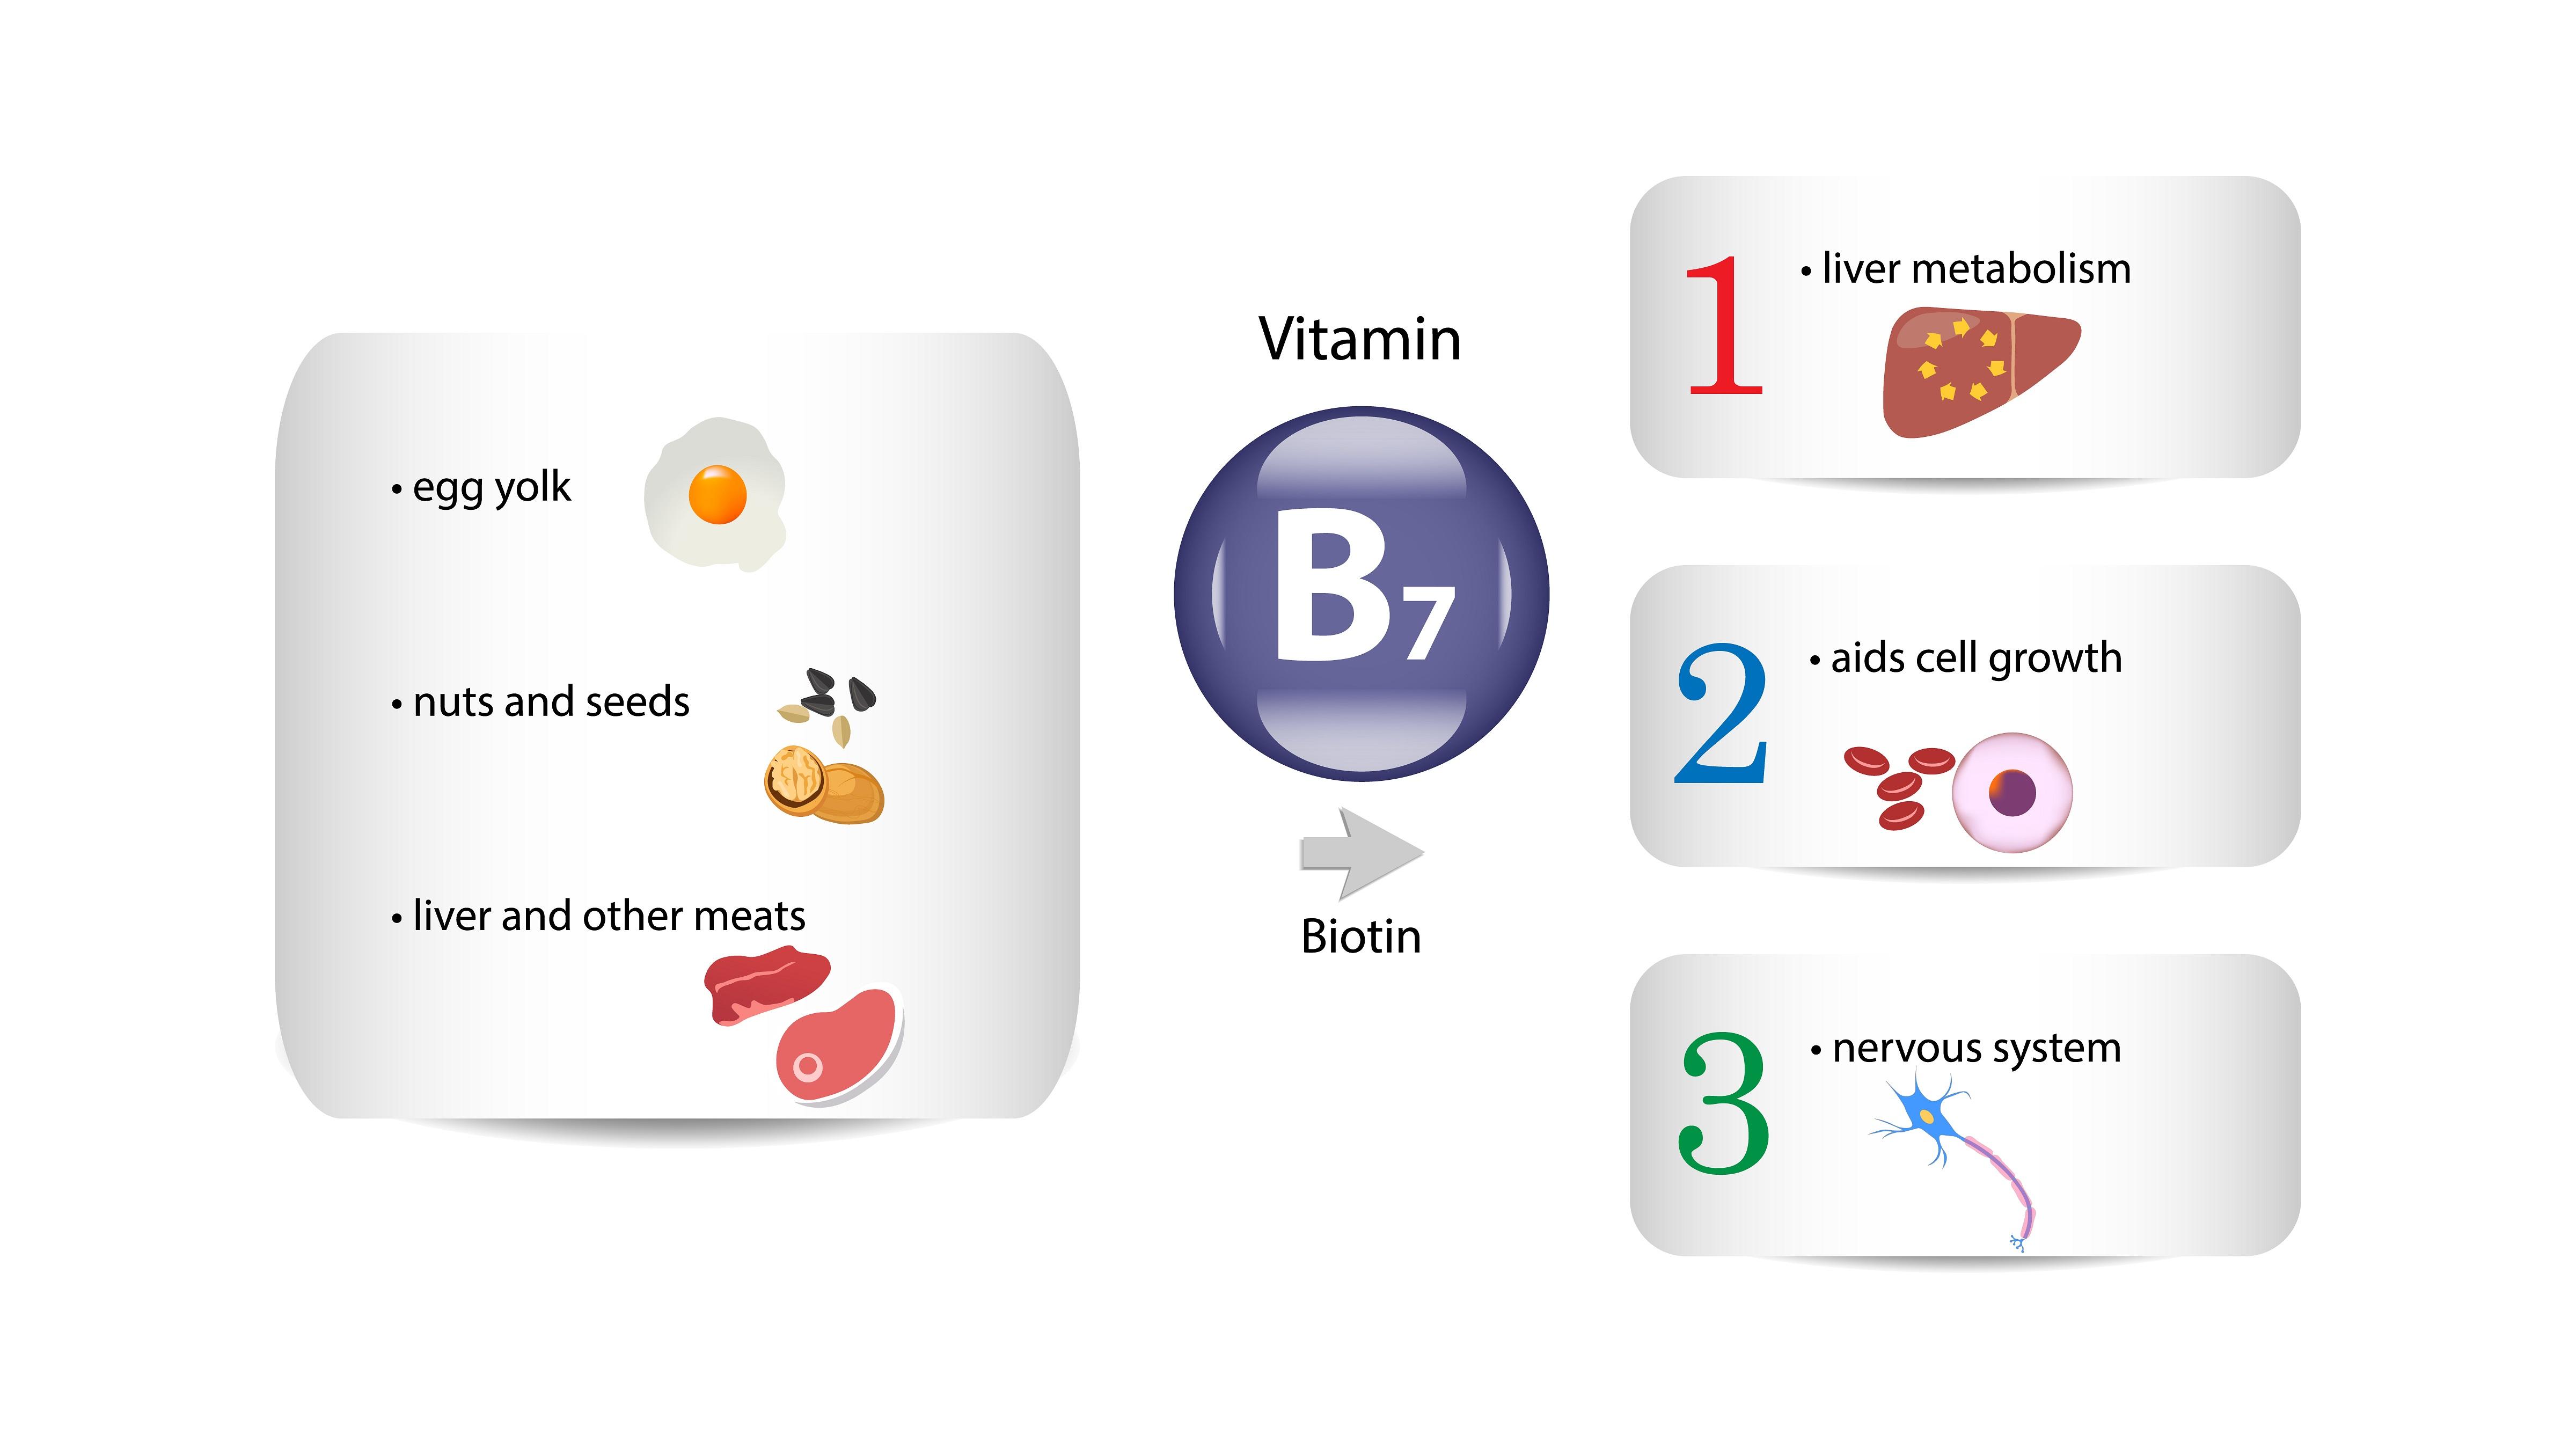 Biotin benefits and sources